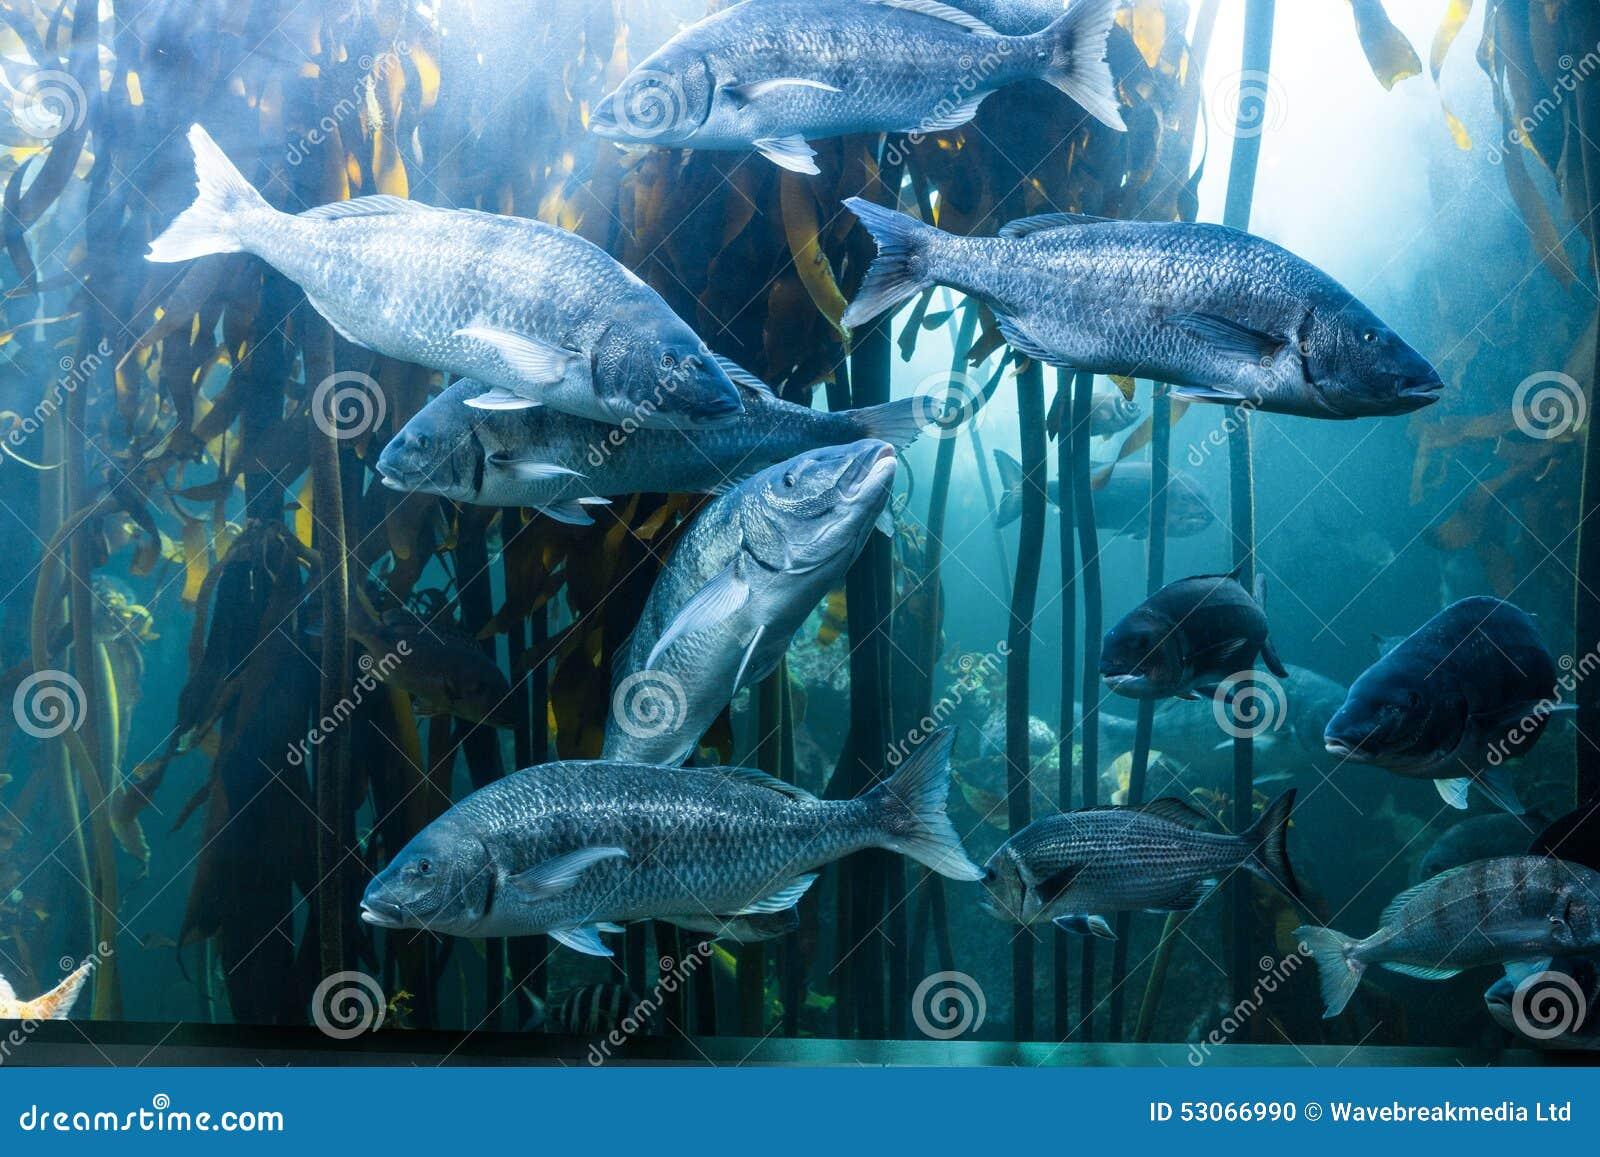 Fish in big aquarium - Big Fish Swimming In A Tank